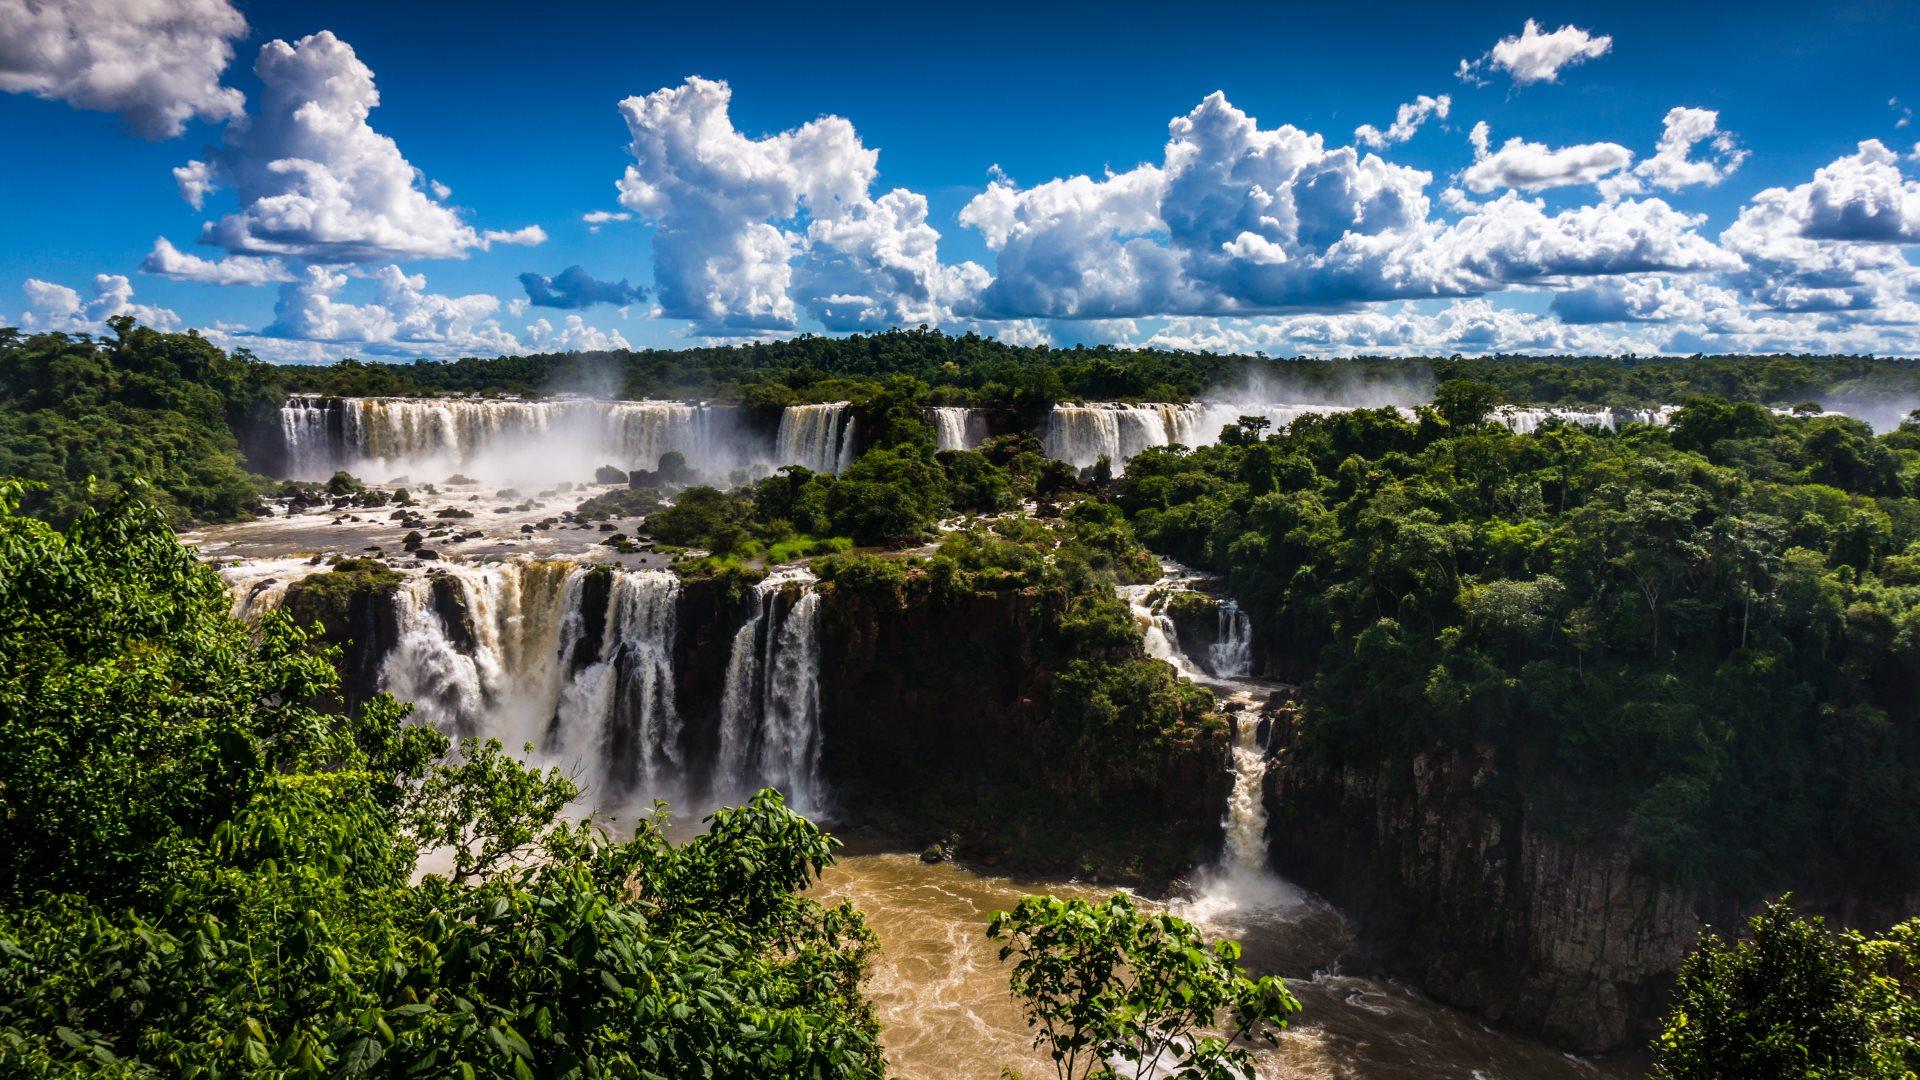 Niagara Water Falls Desktop Wallpaper Brazilian Side Of Iguazu Falls Hd Wallpapers 4k Macbook